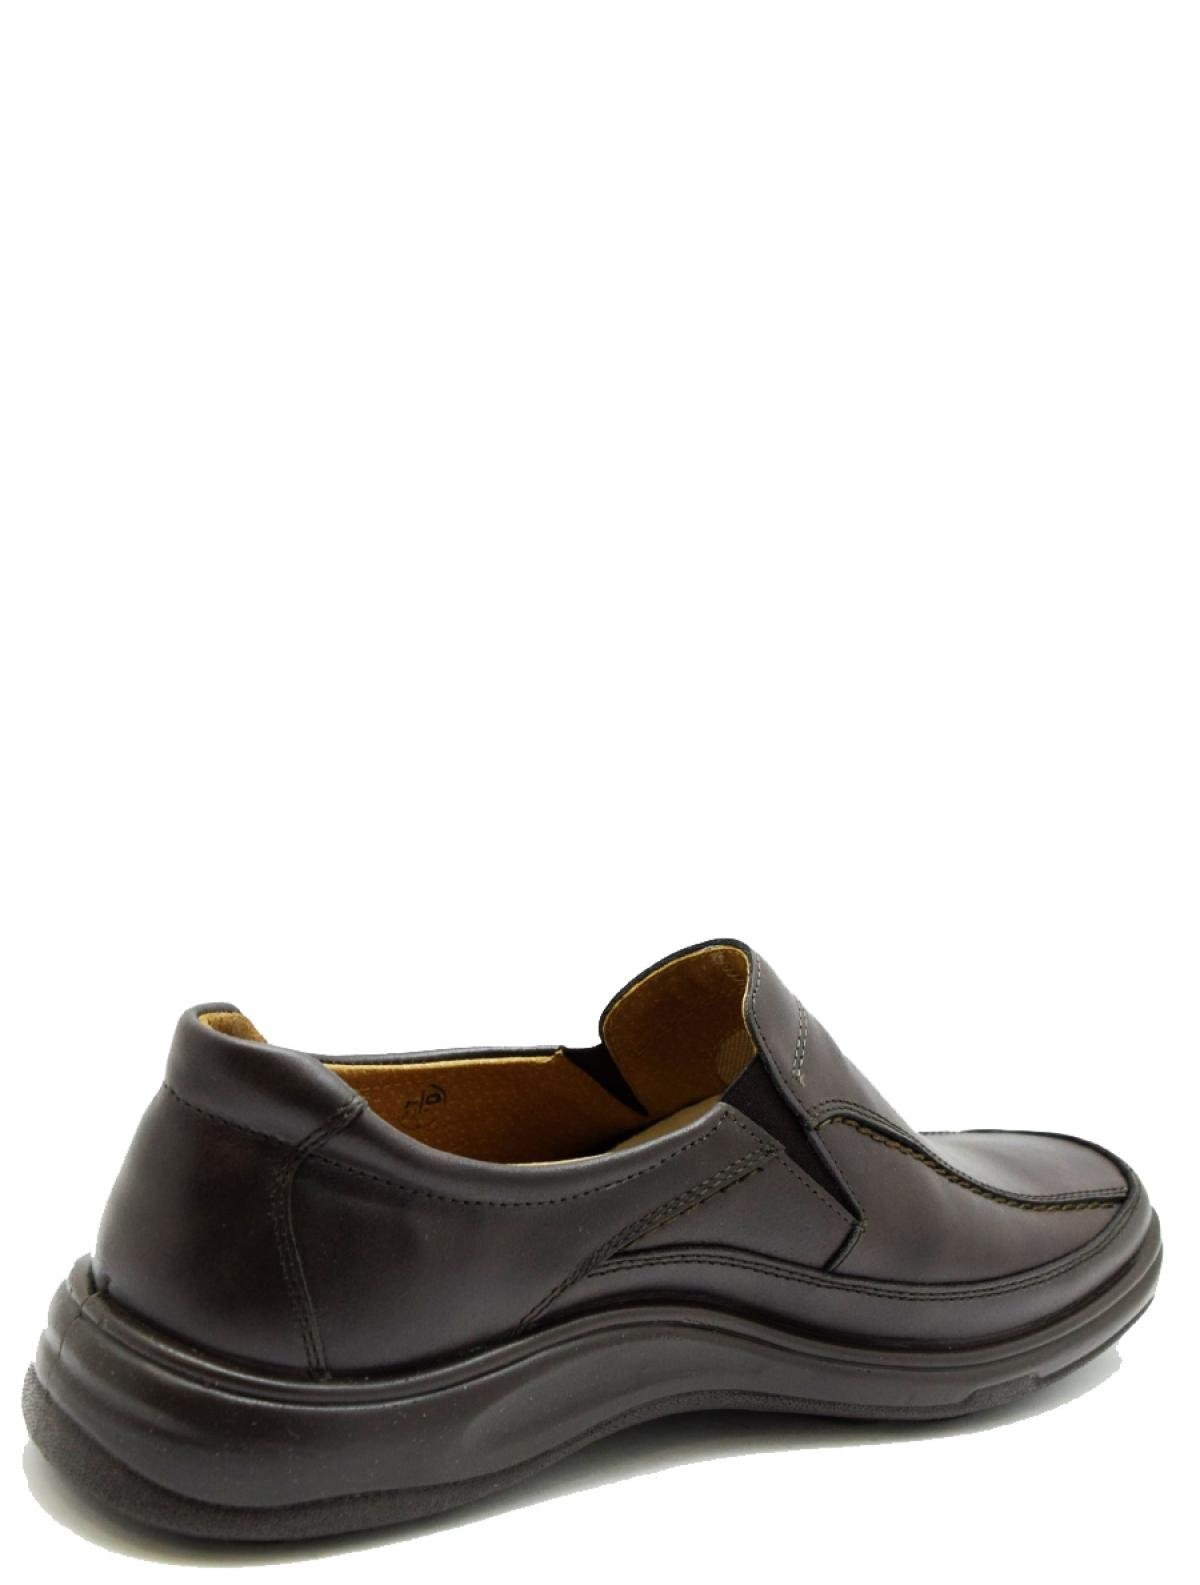 Marko 4735 мужские туфли